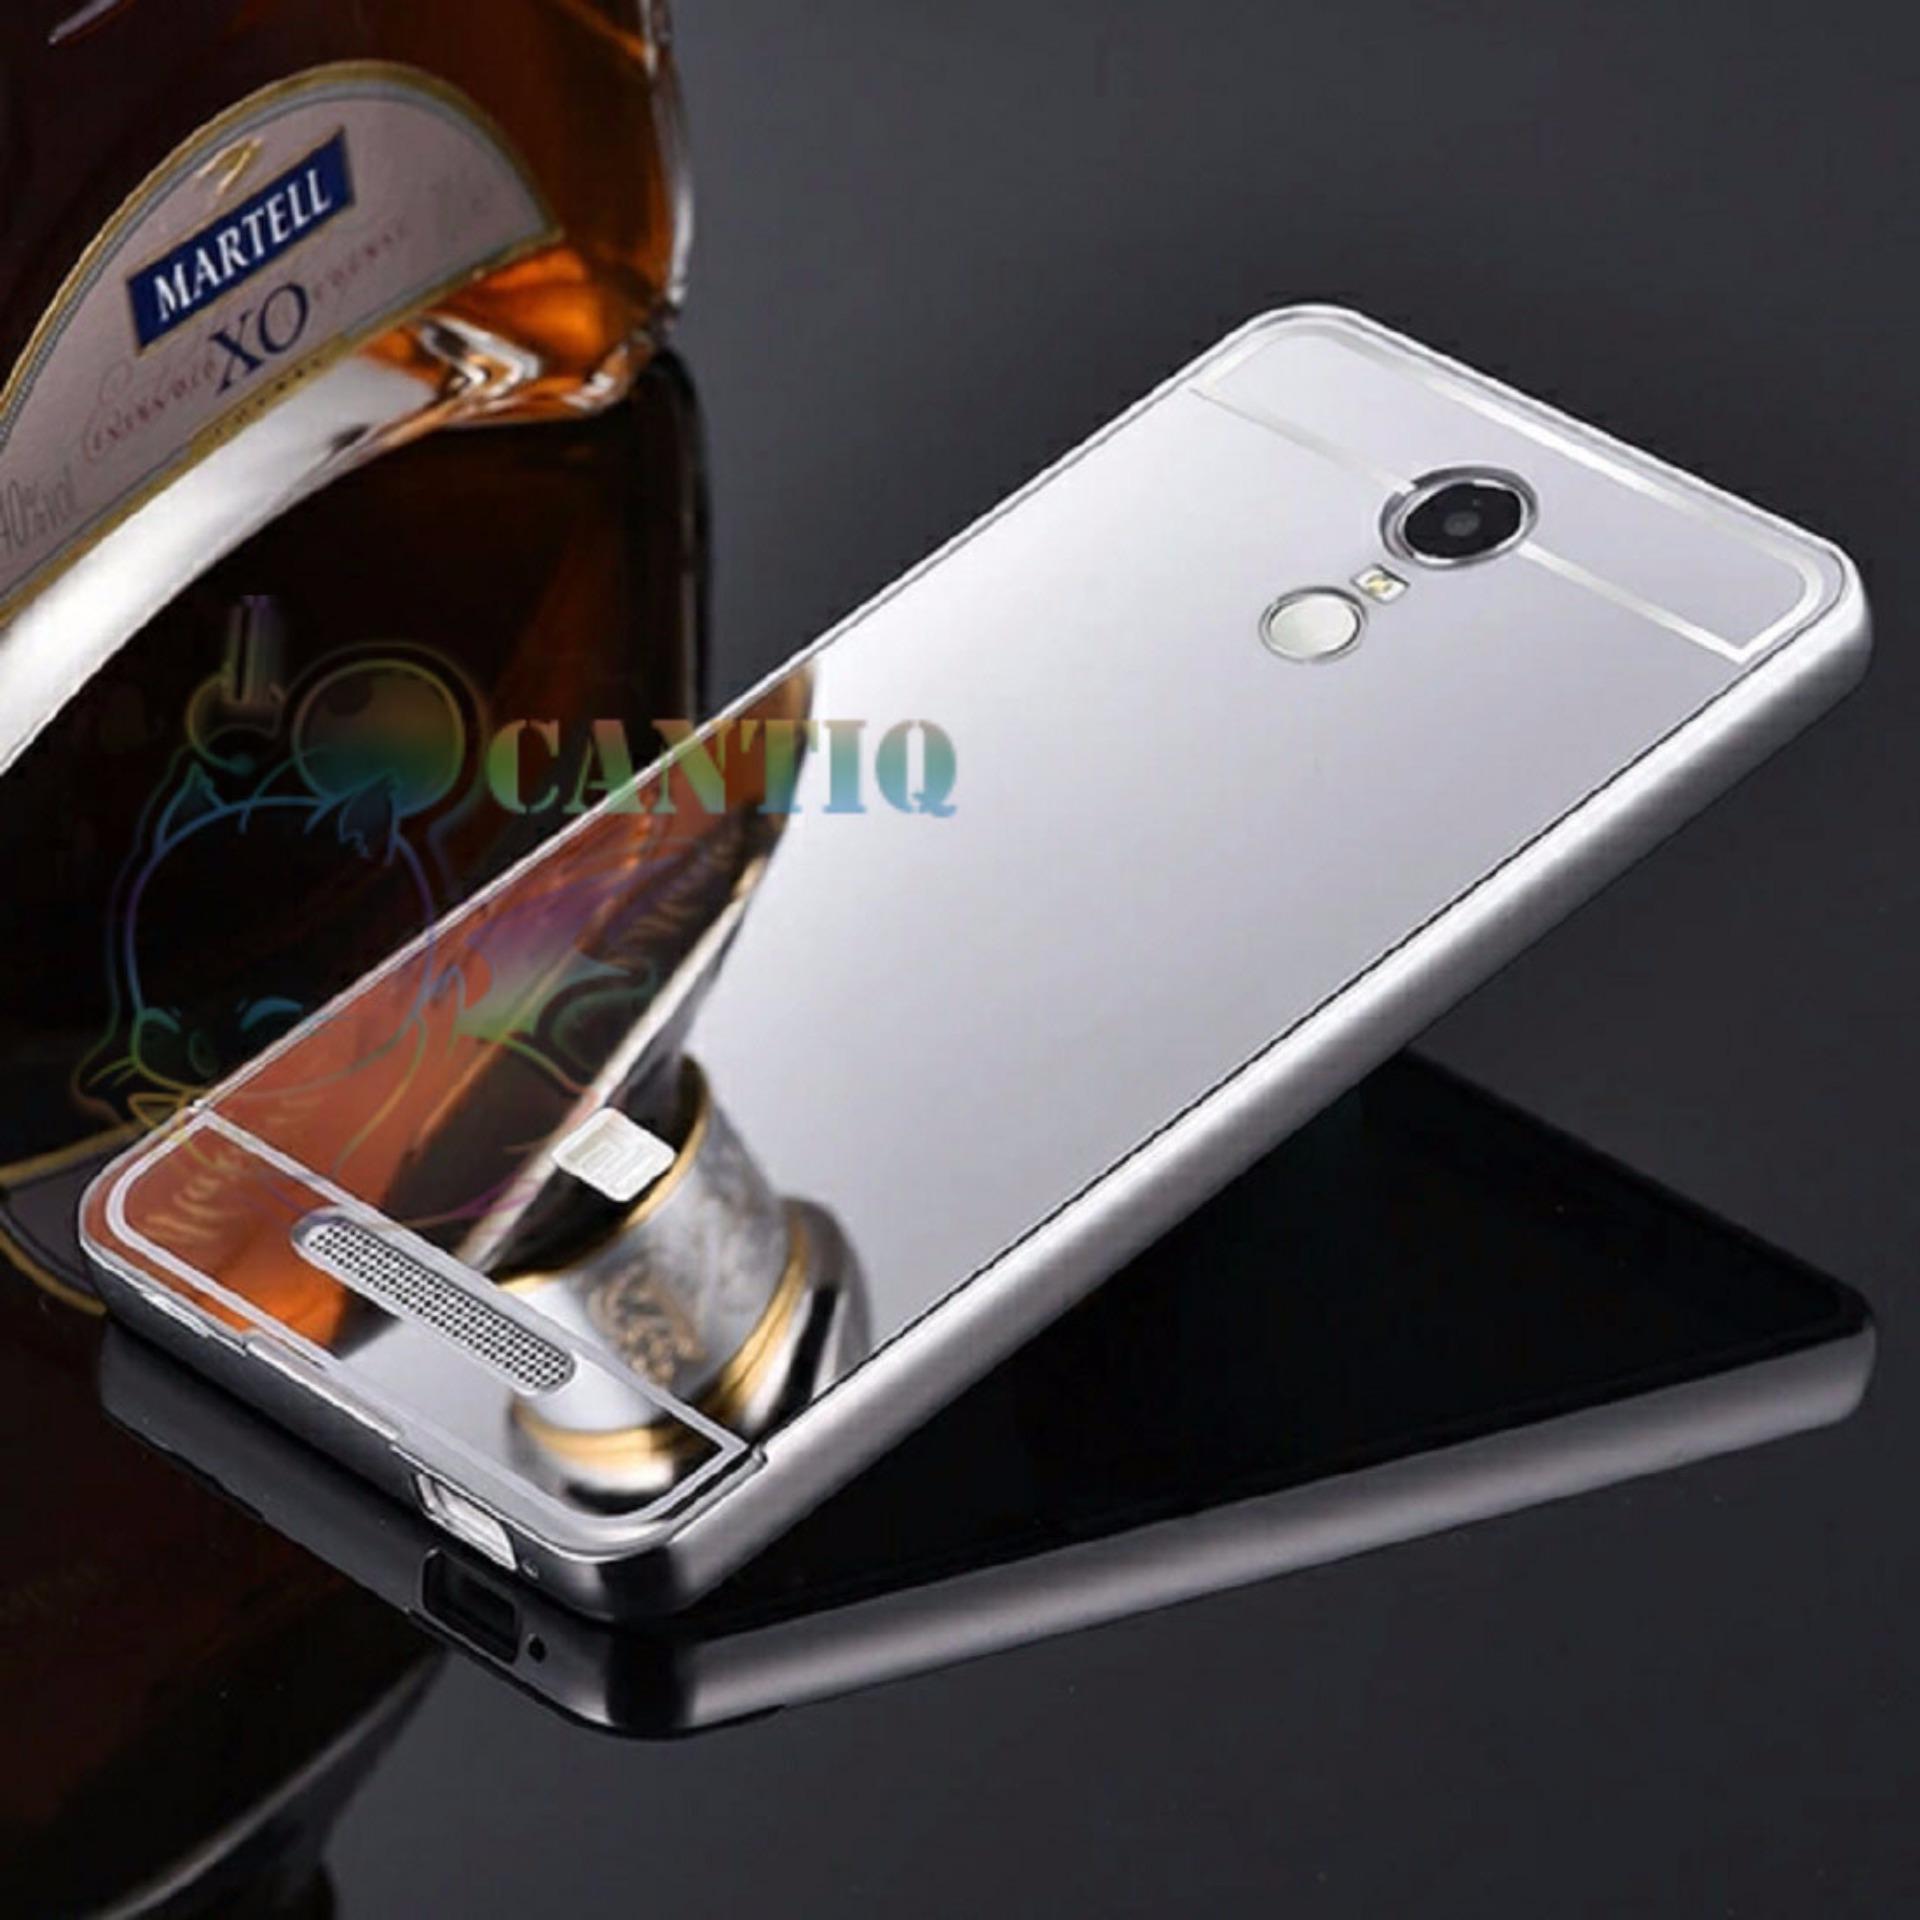 Pencari Harga Qcf Bumper Mirror Untuk Xiaomi Redmi Note 4x Alumunium Metalsliding Hardcase Silver